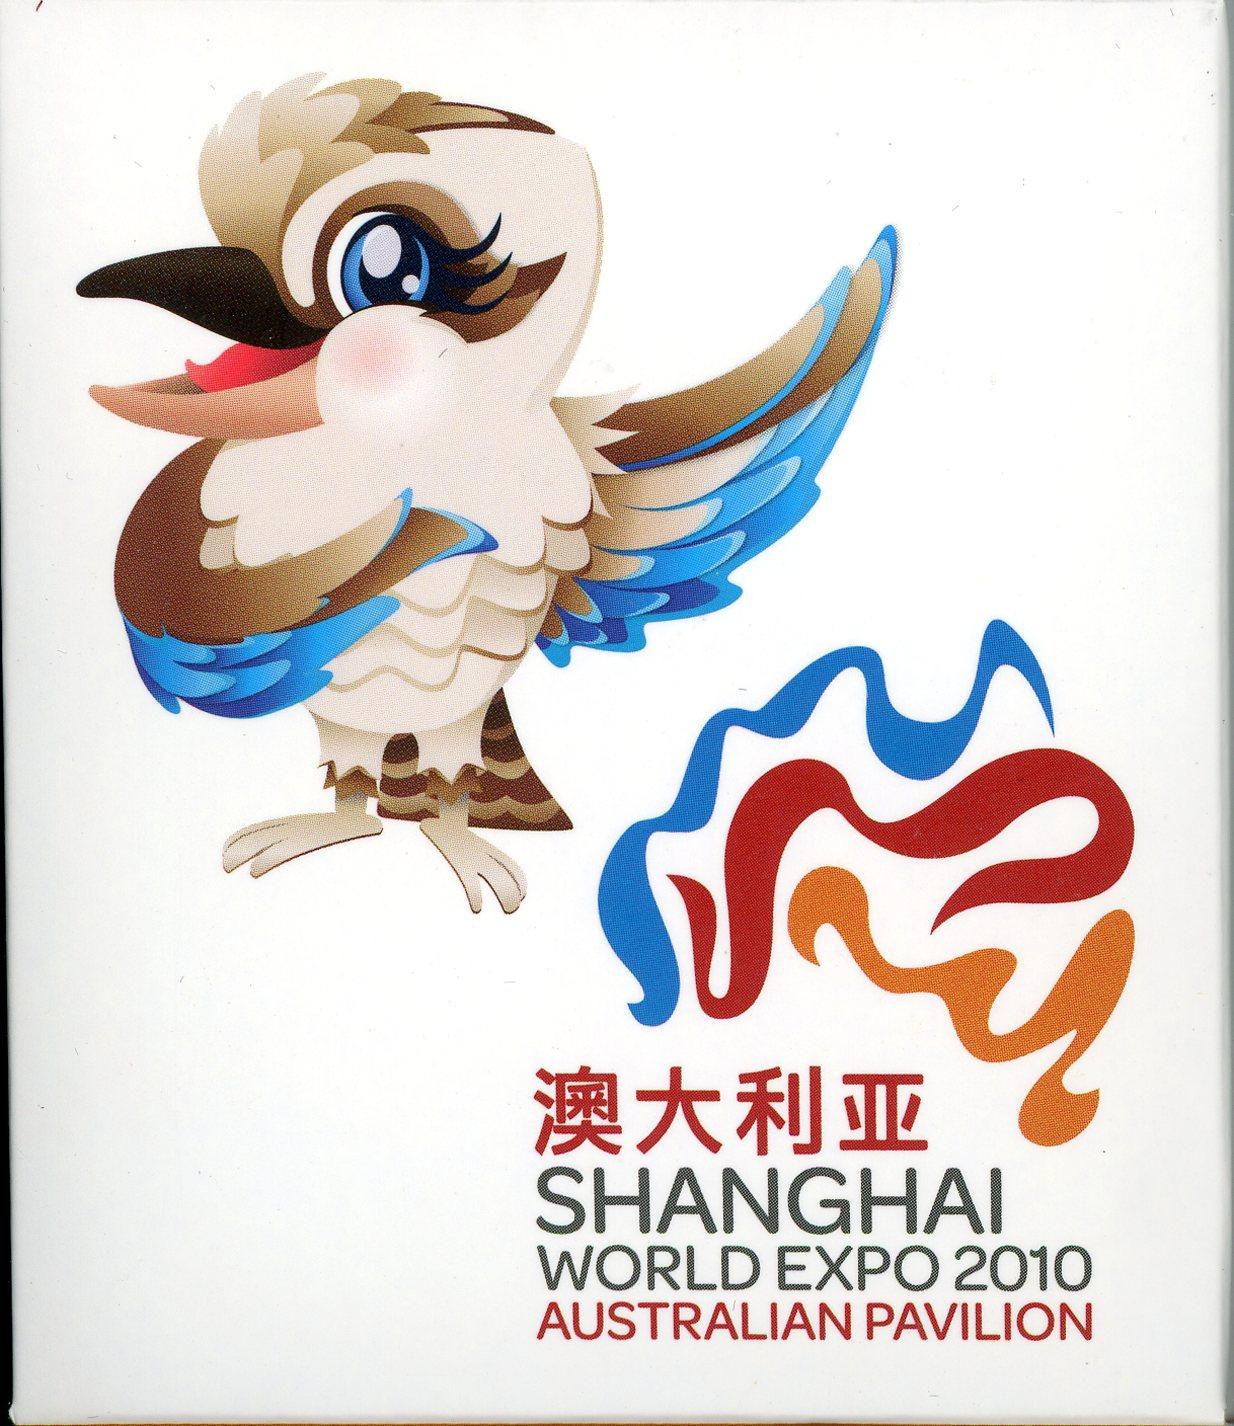 Thumbnail for 2010 Shanghai World Expo 1oz Coloured Silver Proof - Kookaburra Mascot